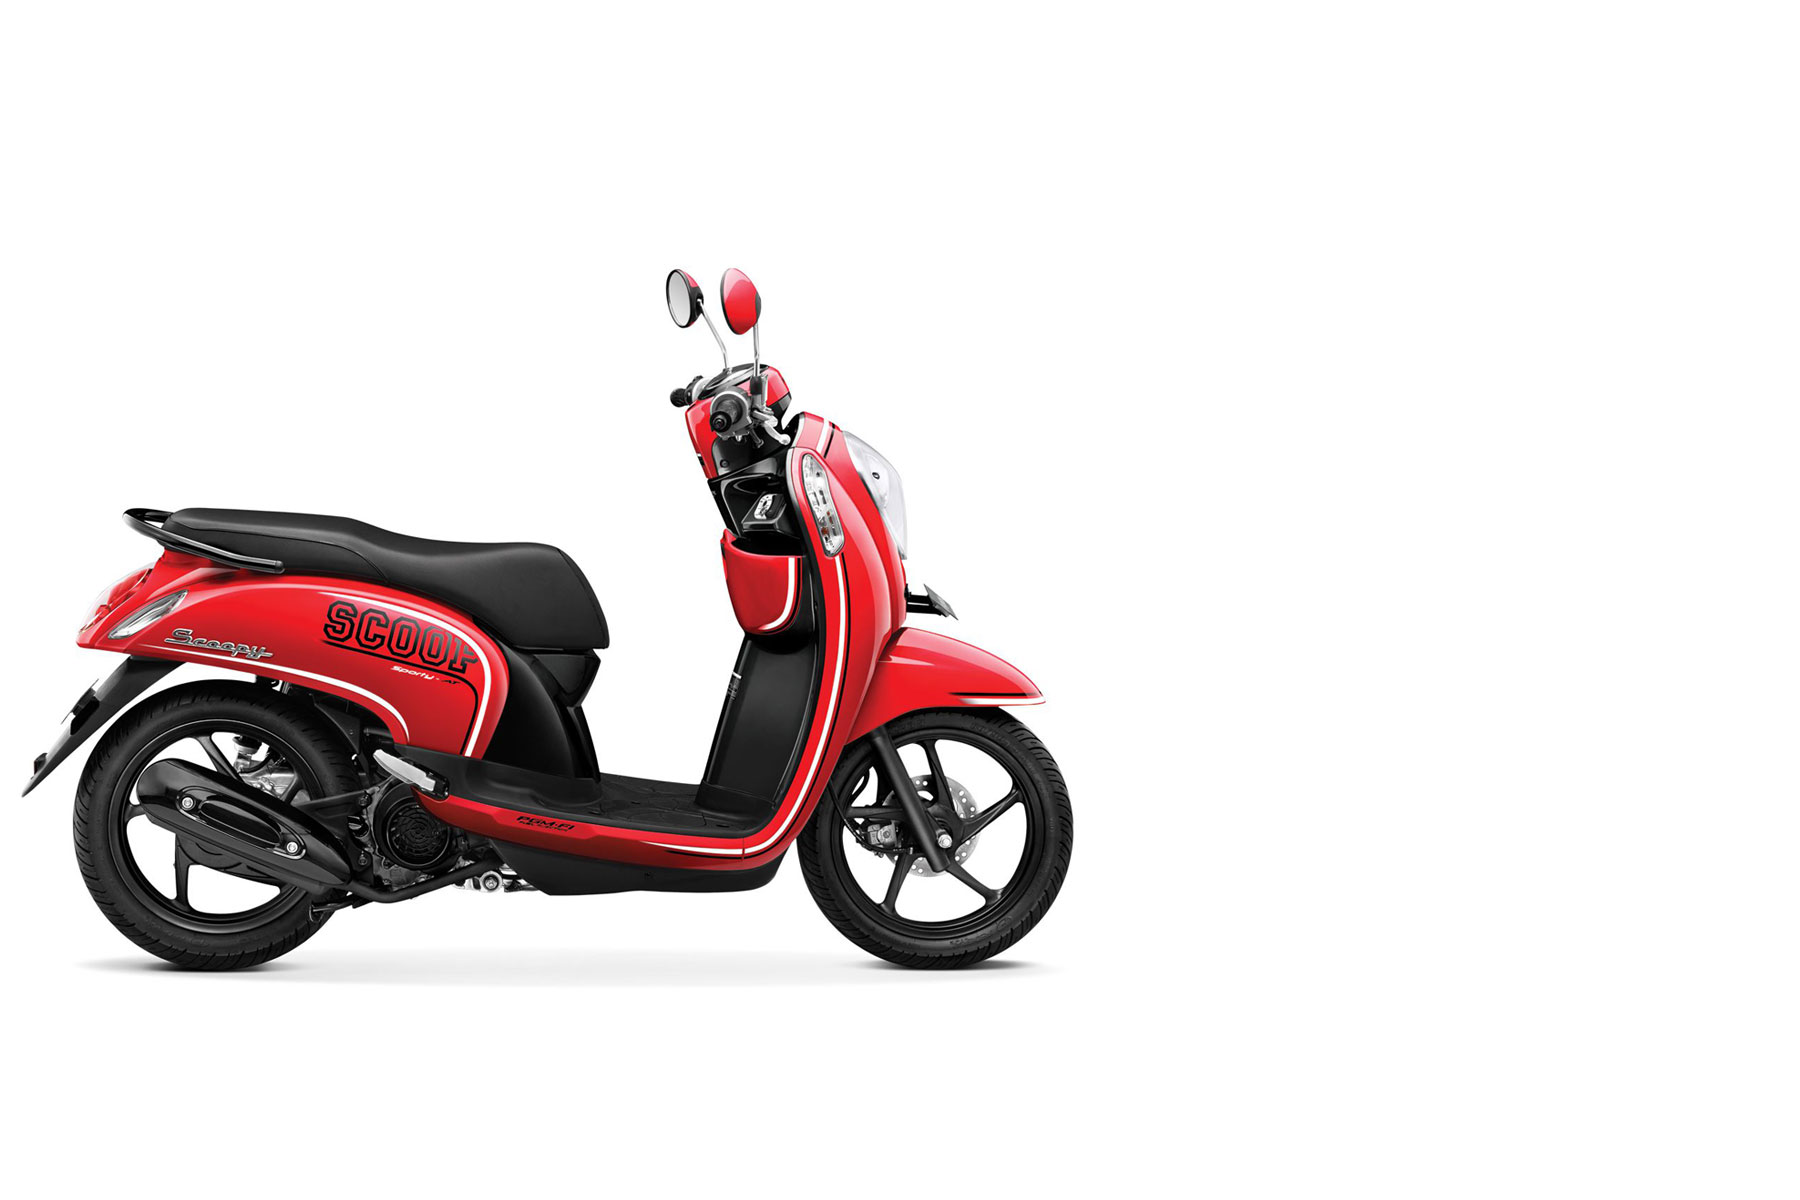 New-Honda-Scoopy-FI-Sporty-Estate-Red.jpg